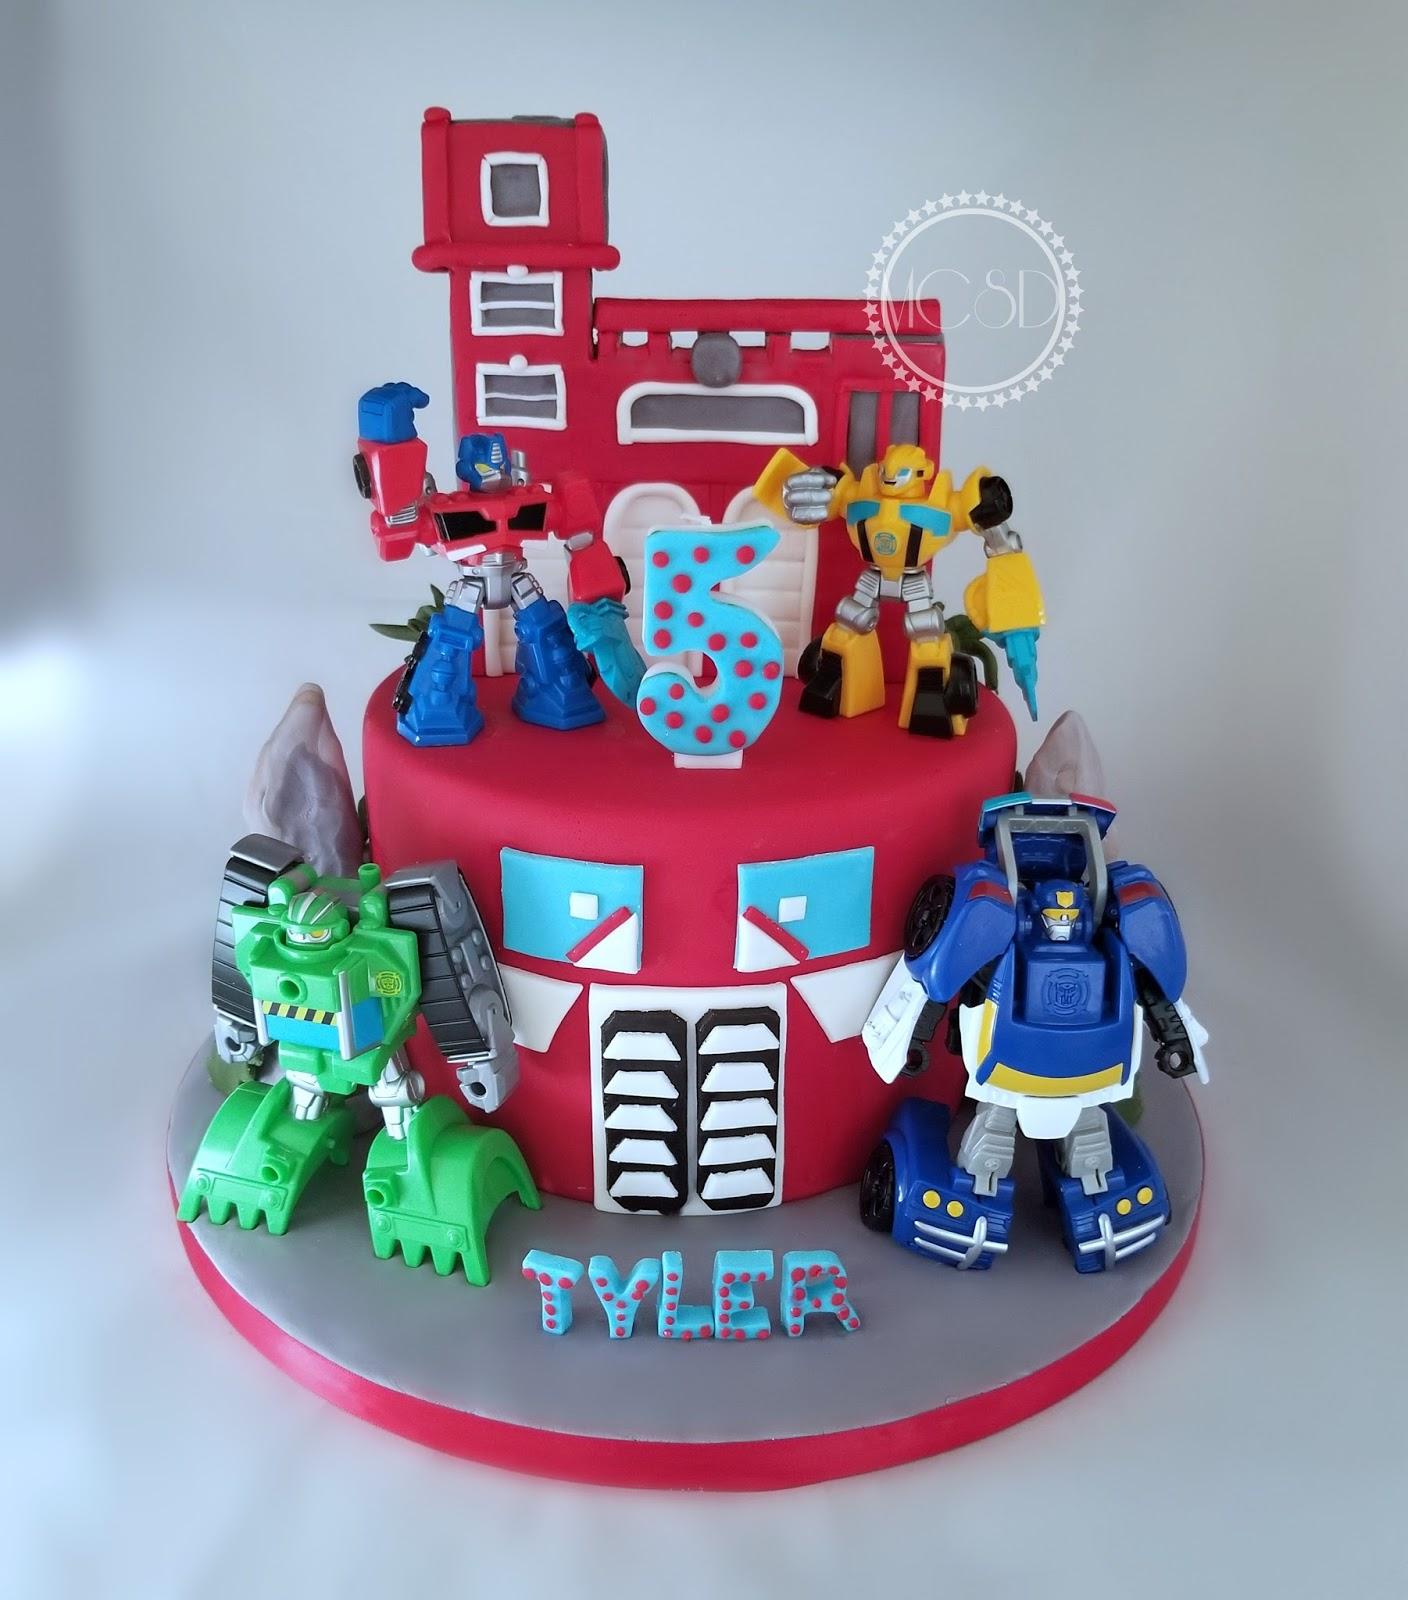 My Cake Sweet Dreams Rescue Bots Cake